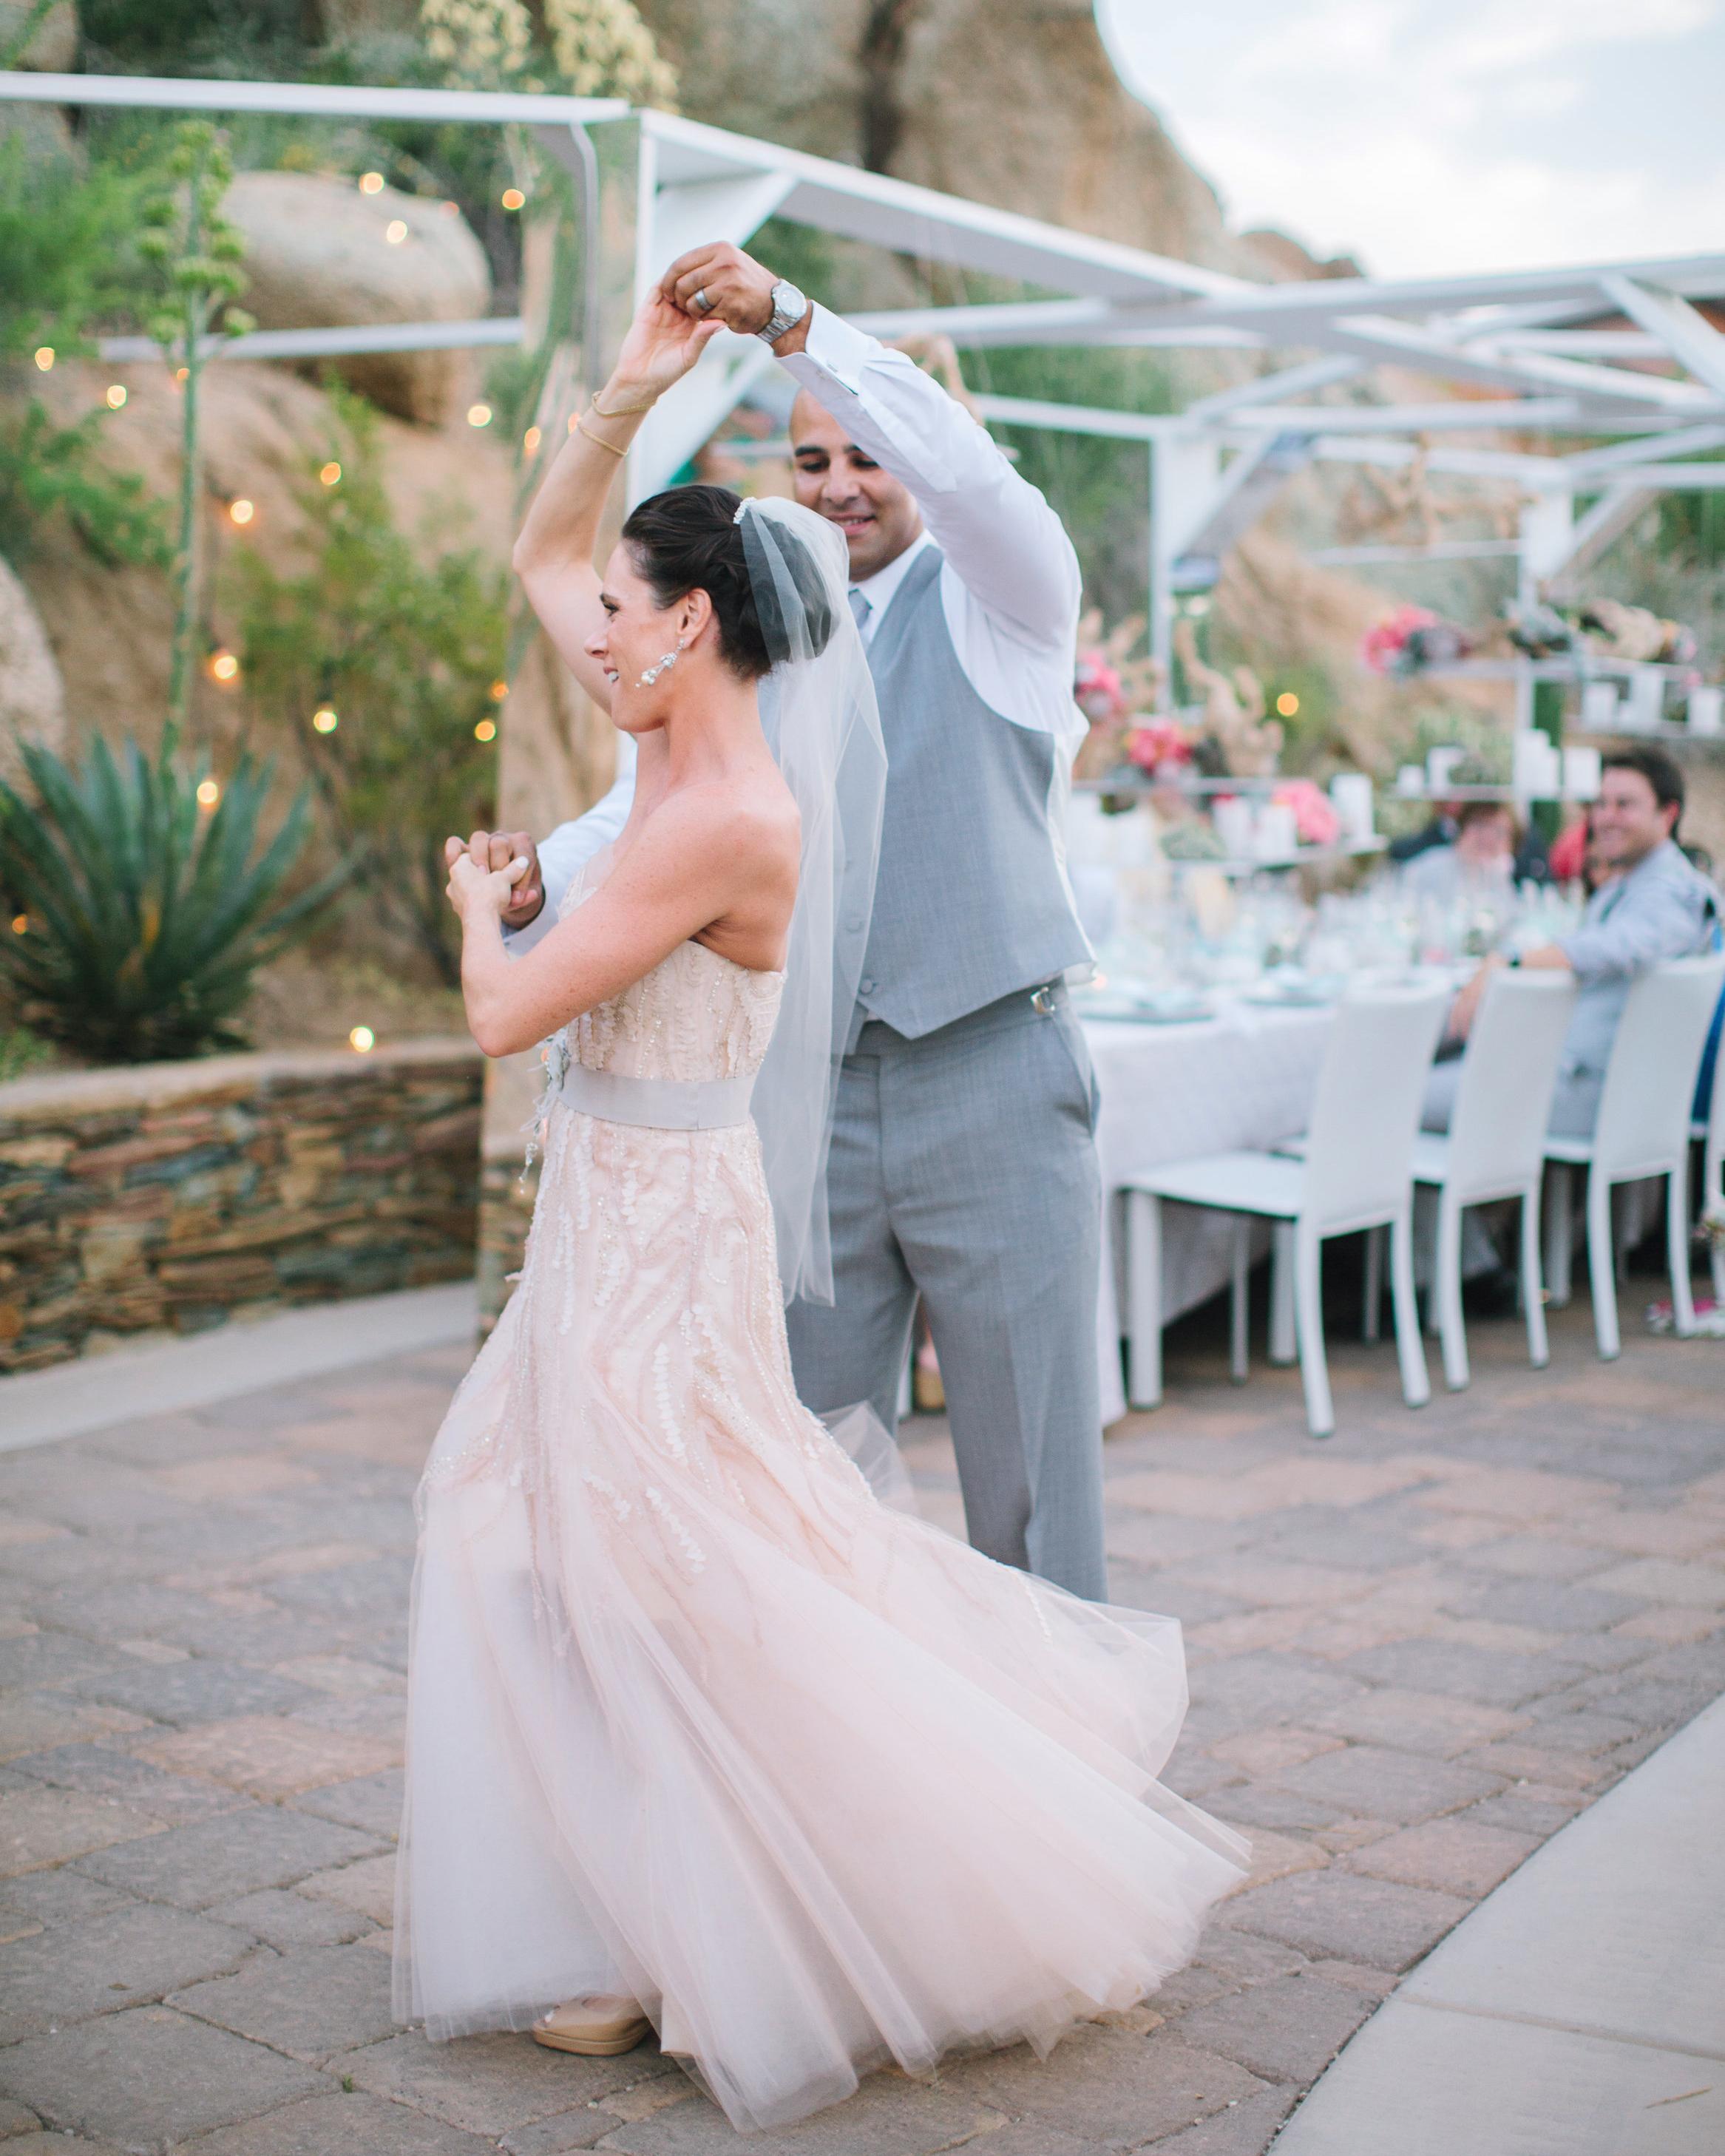 kari-charlie-wedding-dance-0314.jpg